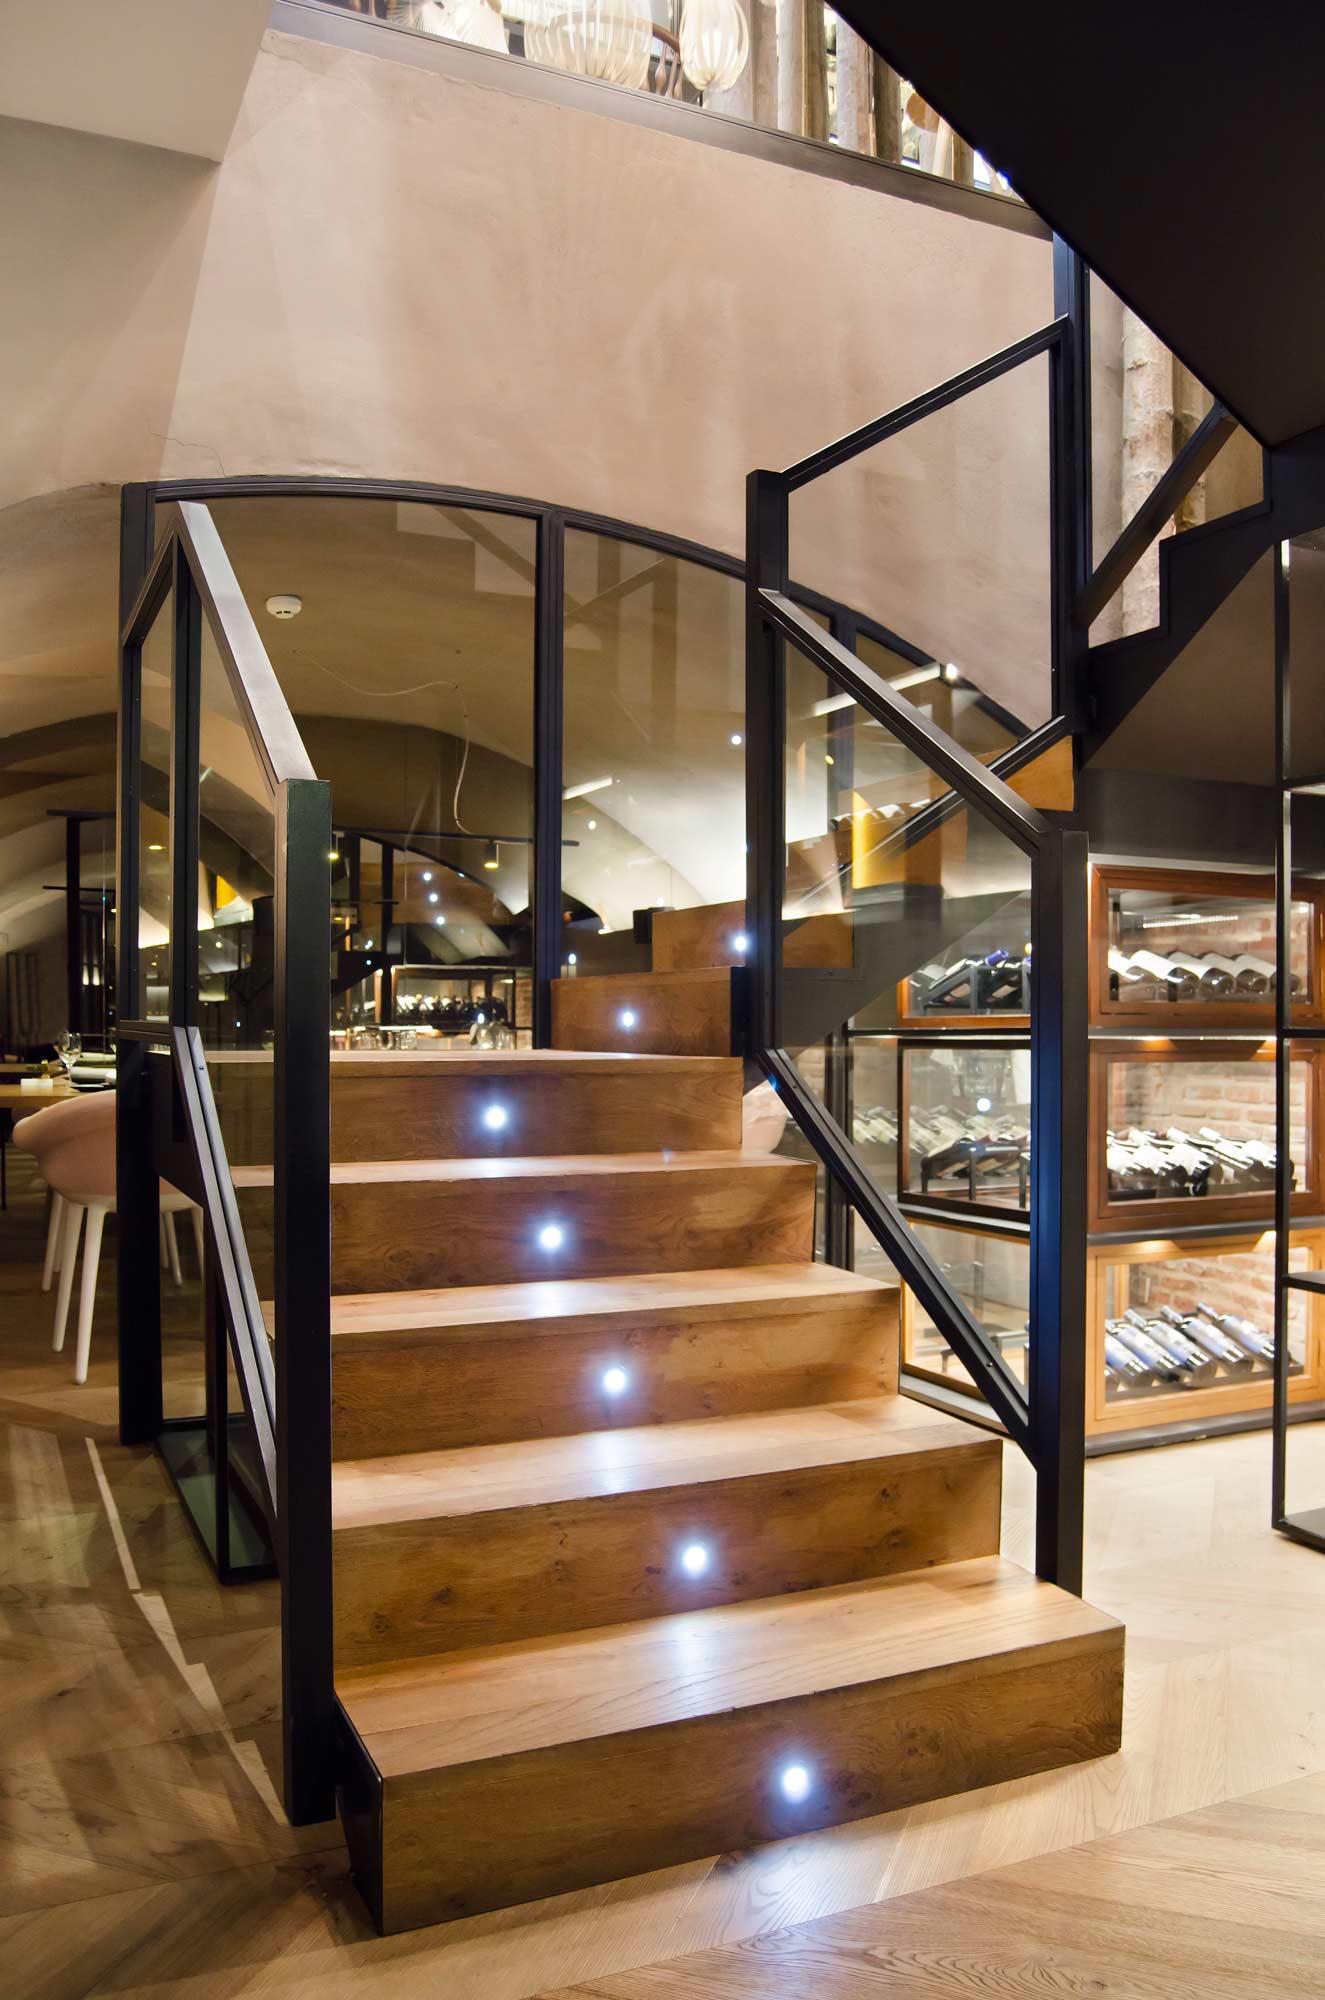 Escaleras madera baranda metal